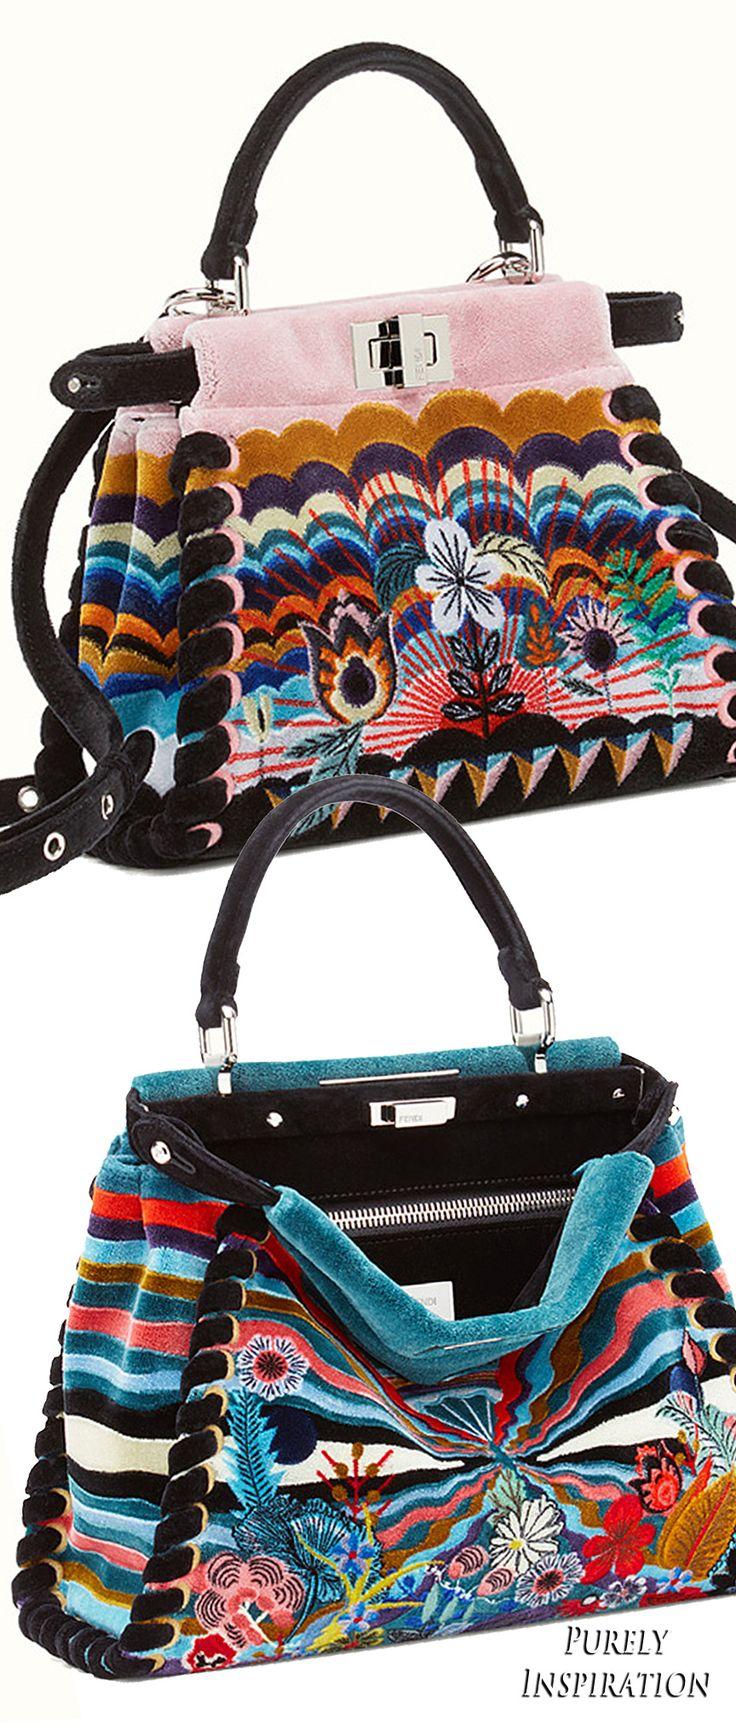 Fendi Peekaboo Handbags   Purely Inspiration